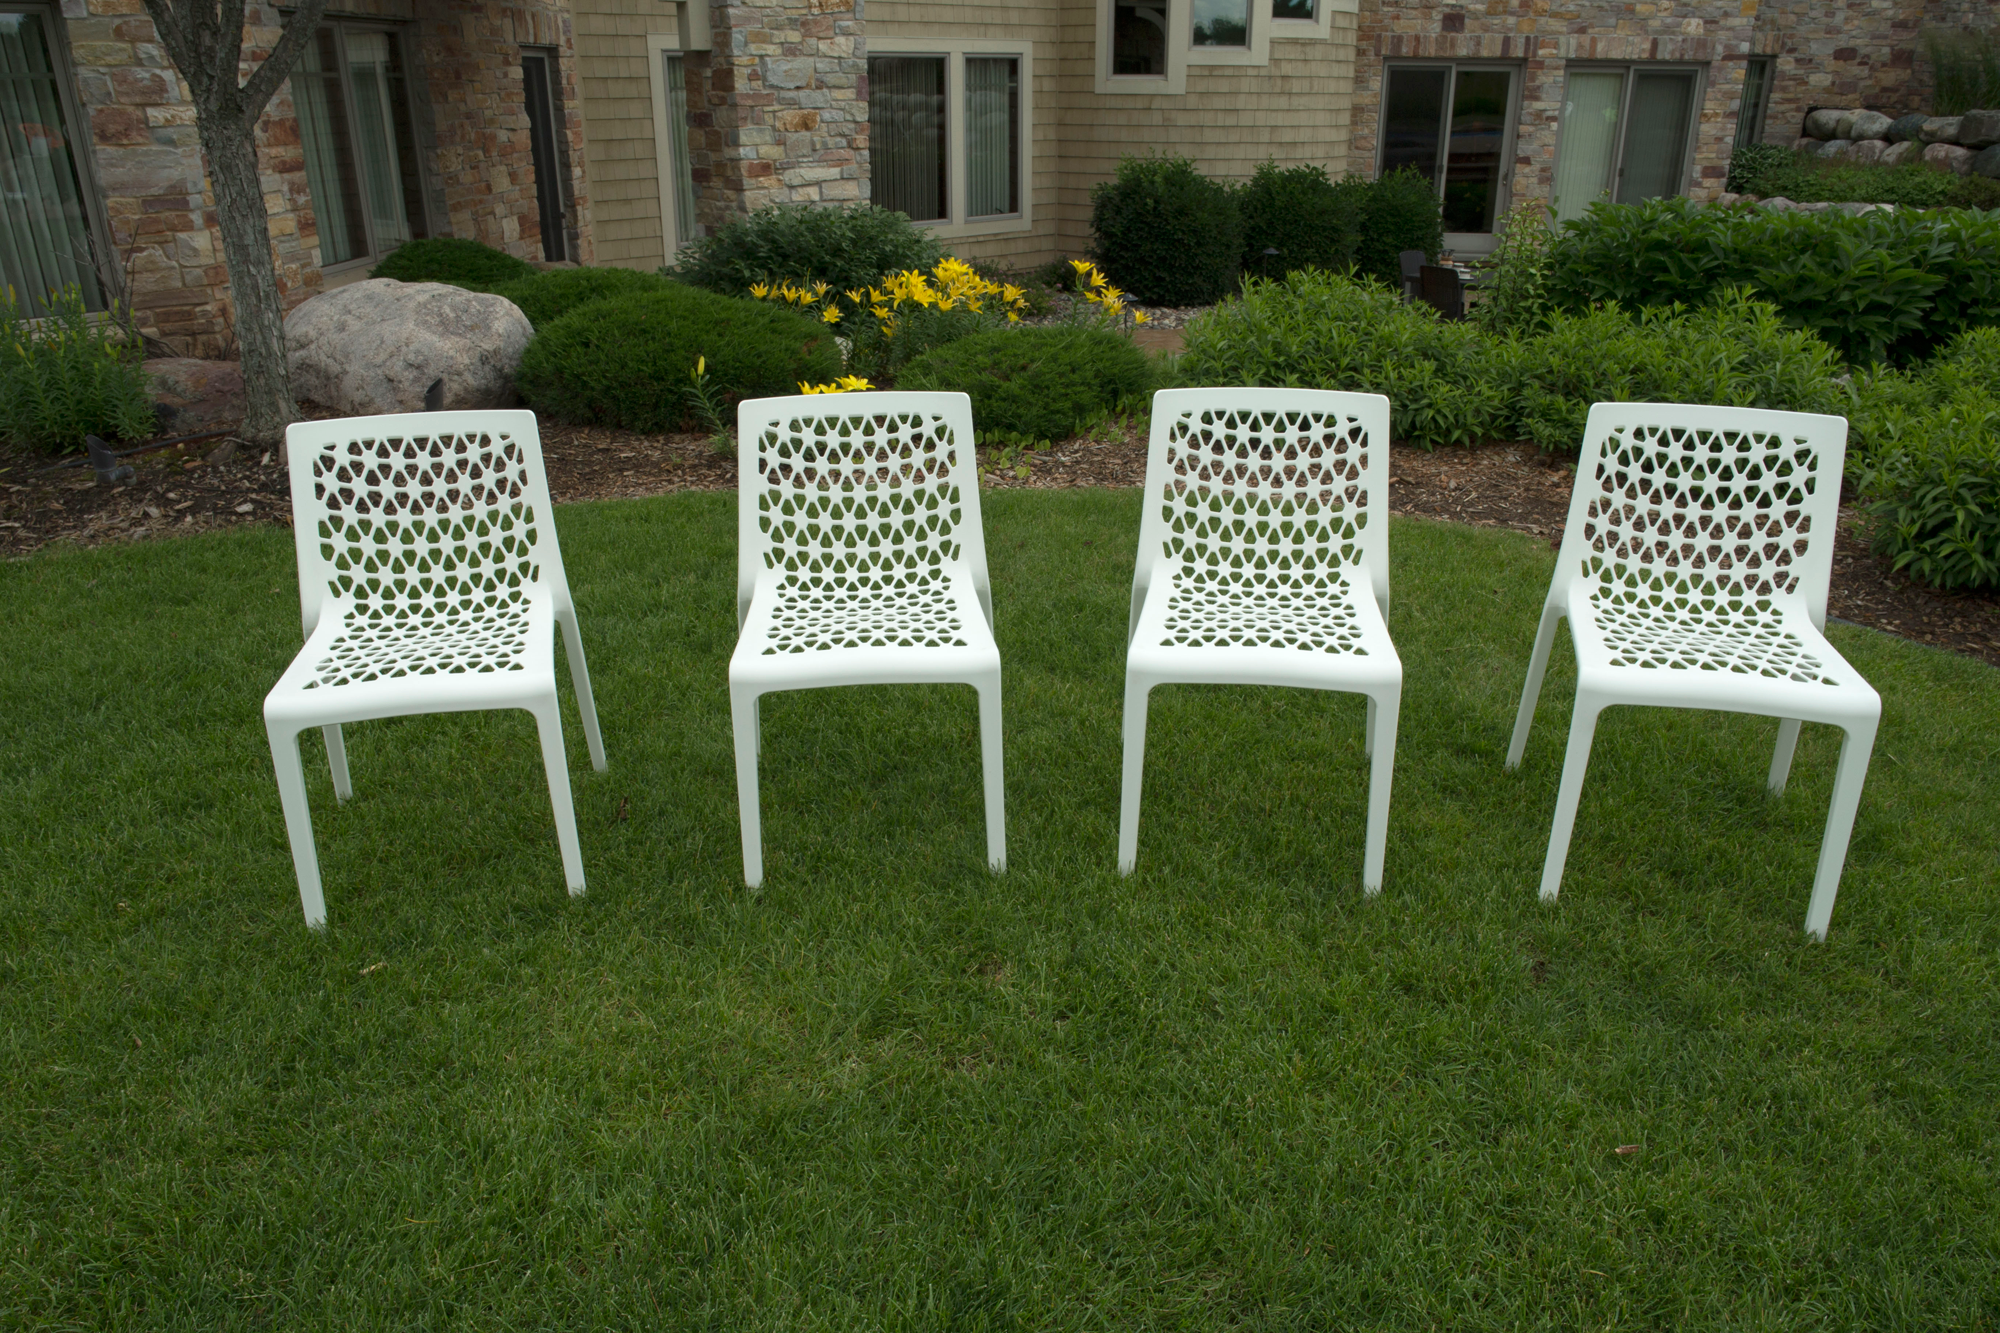 The Milan Plastic Chair